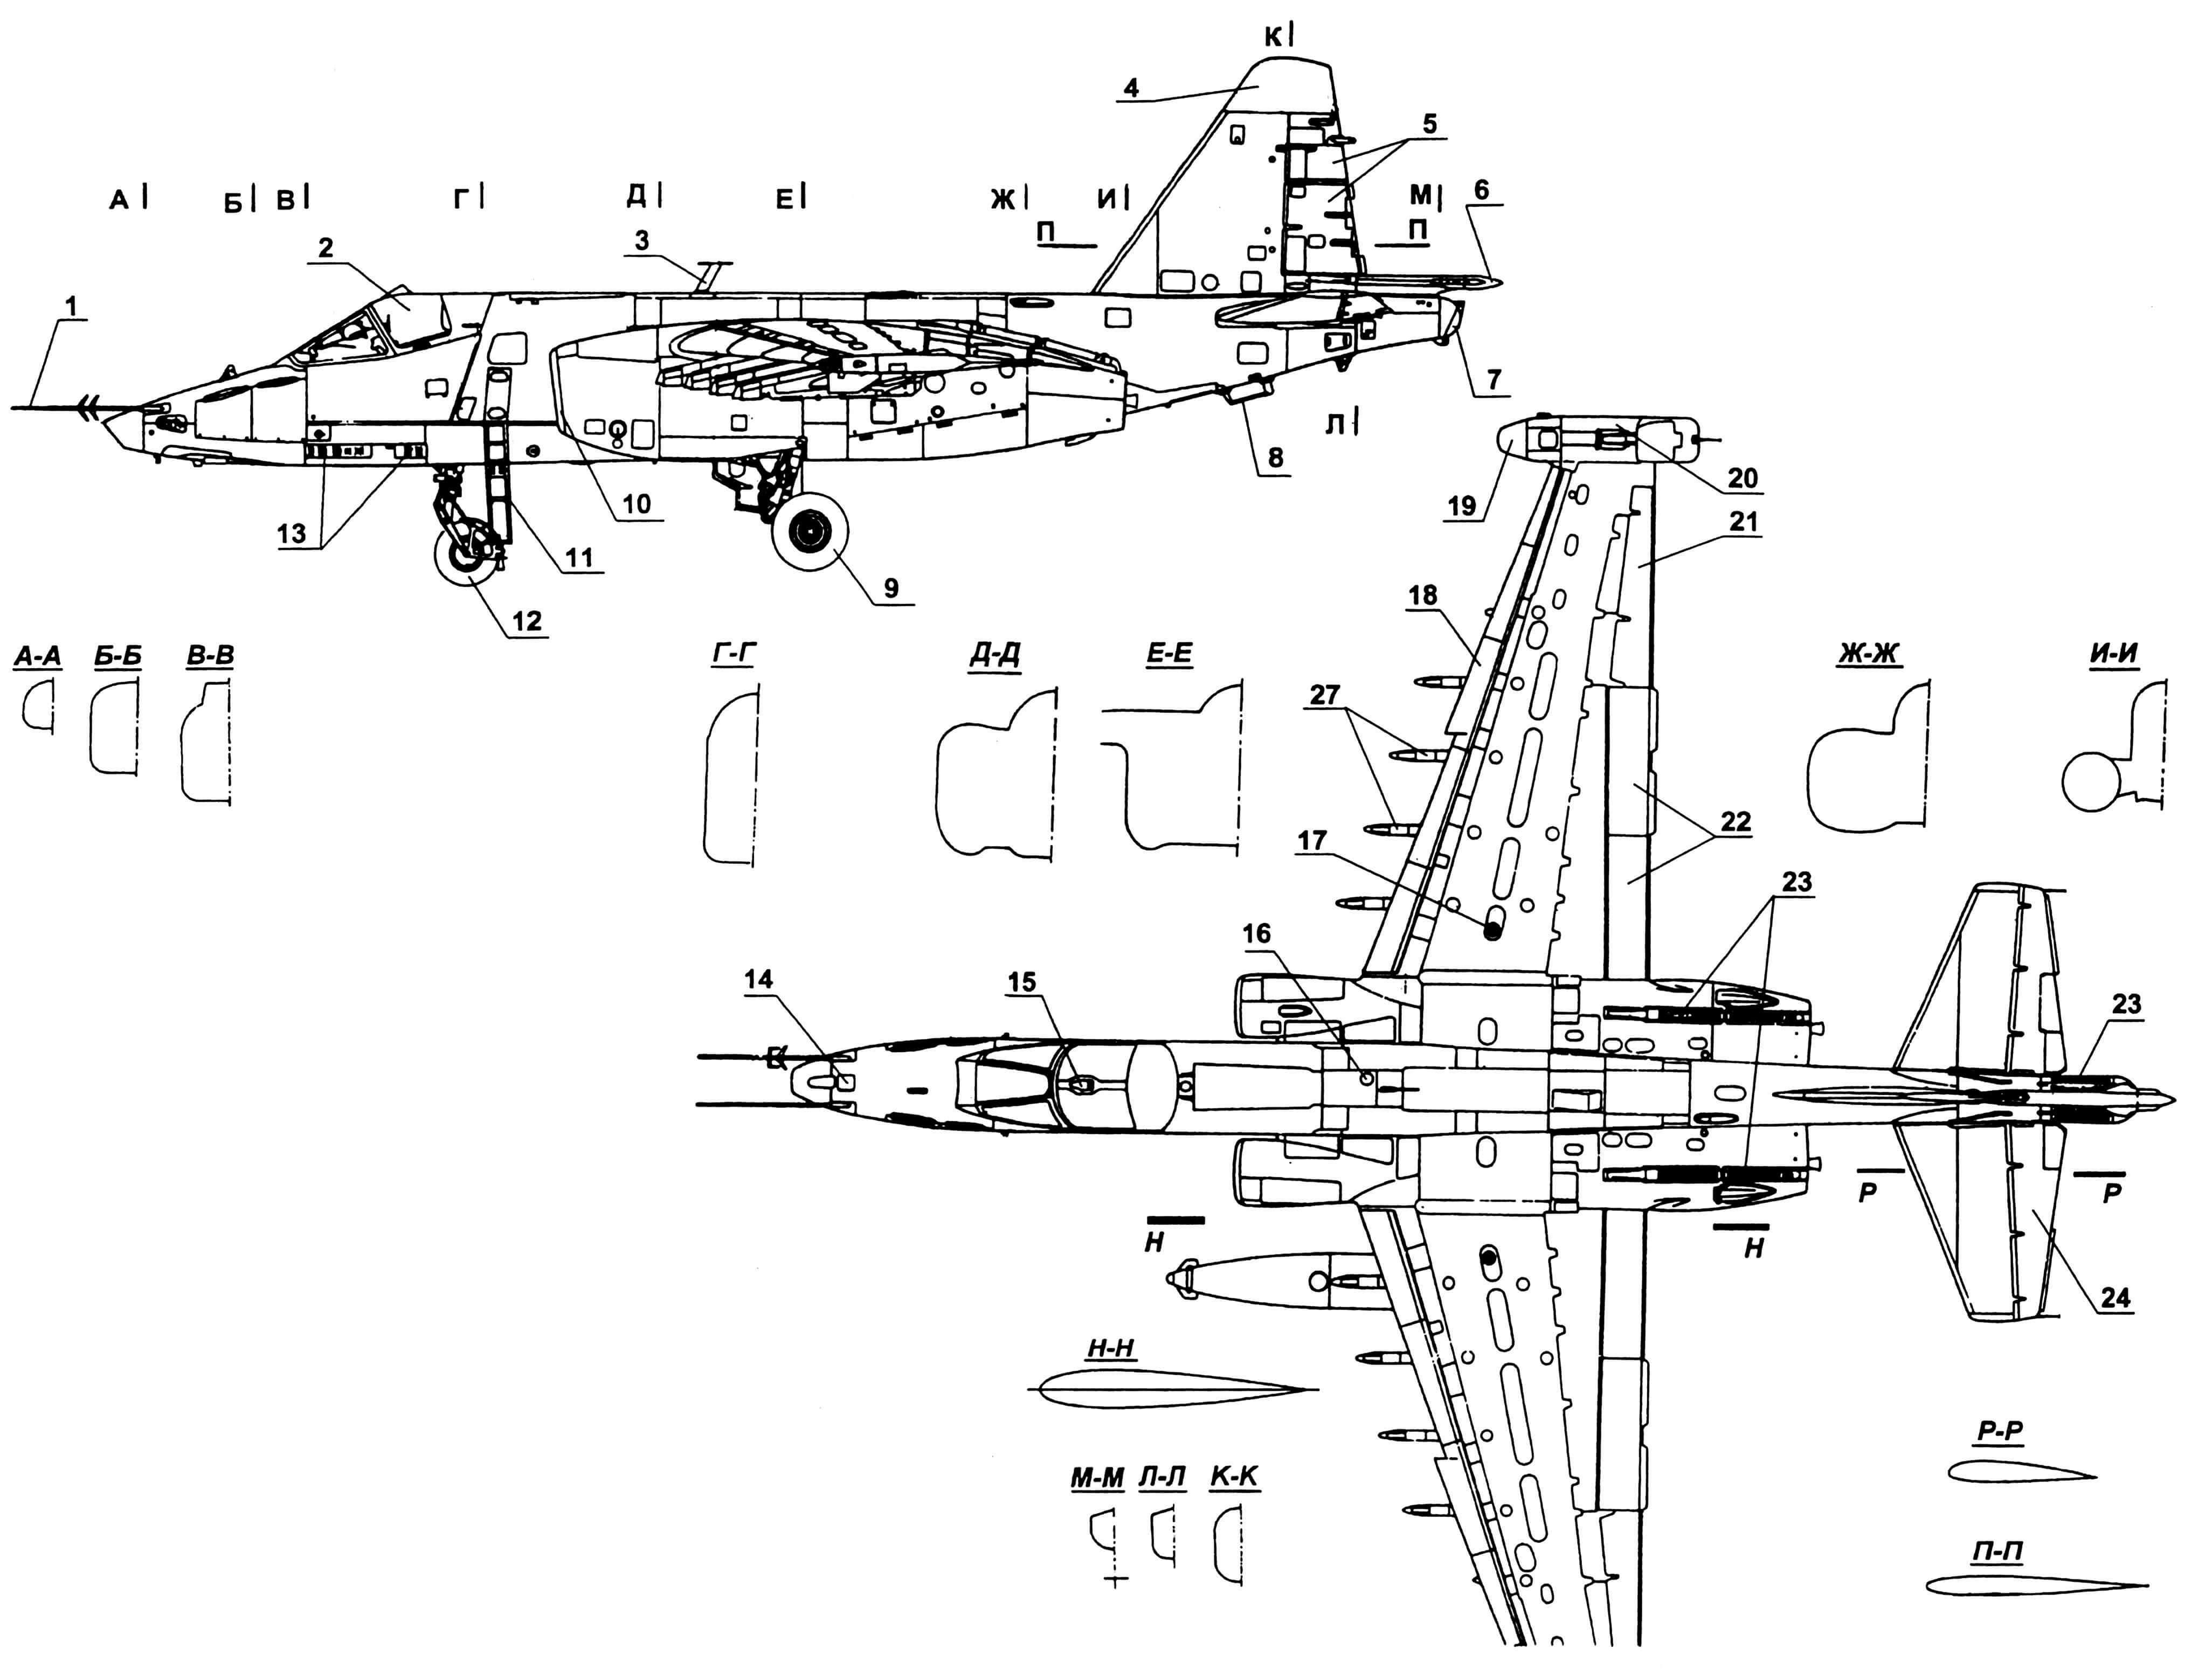 Самолет су-25 грач. фото. история. характеристики.